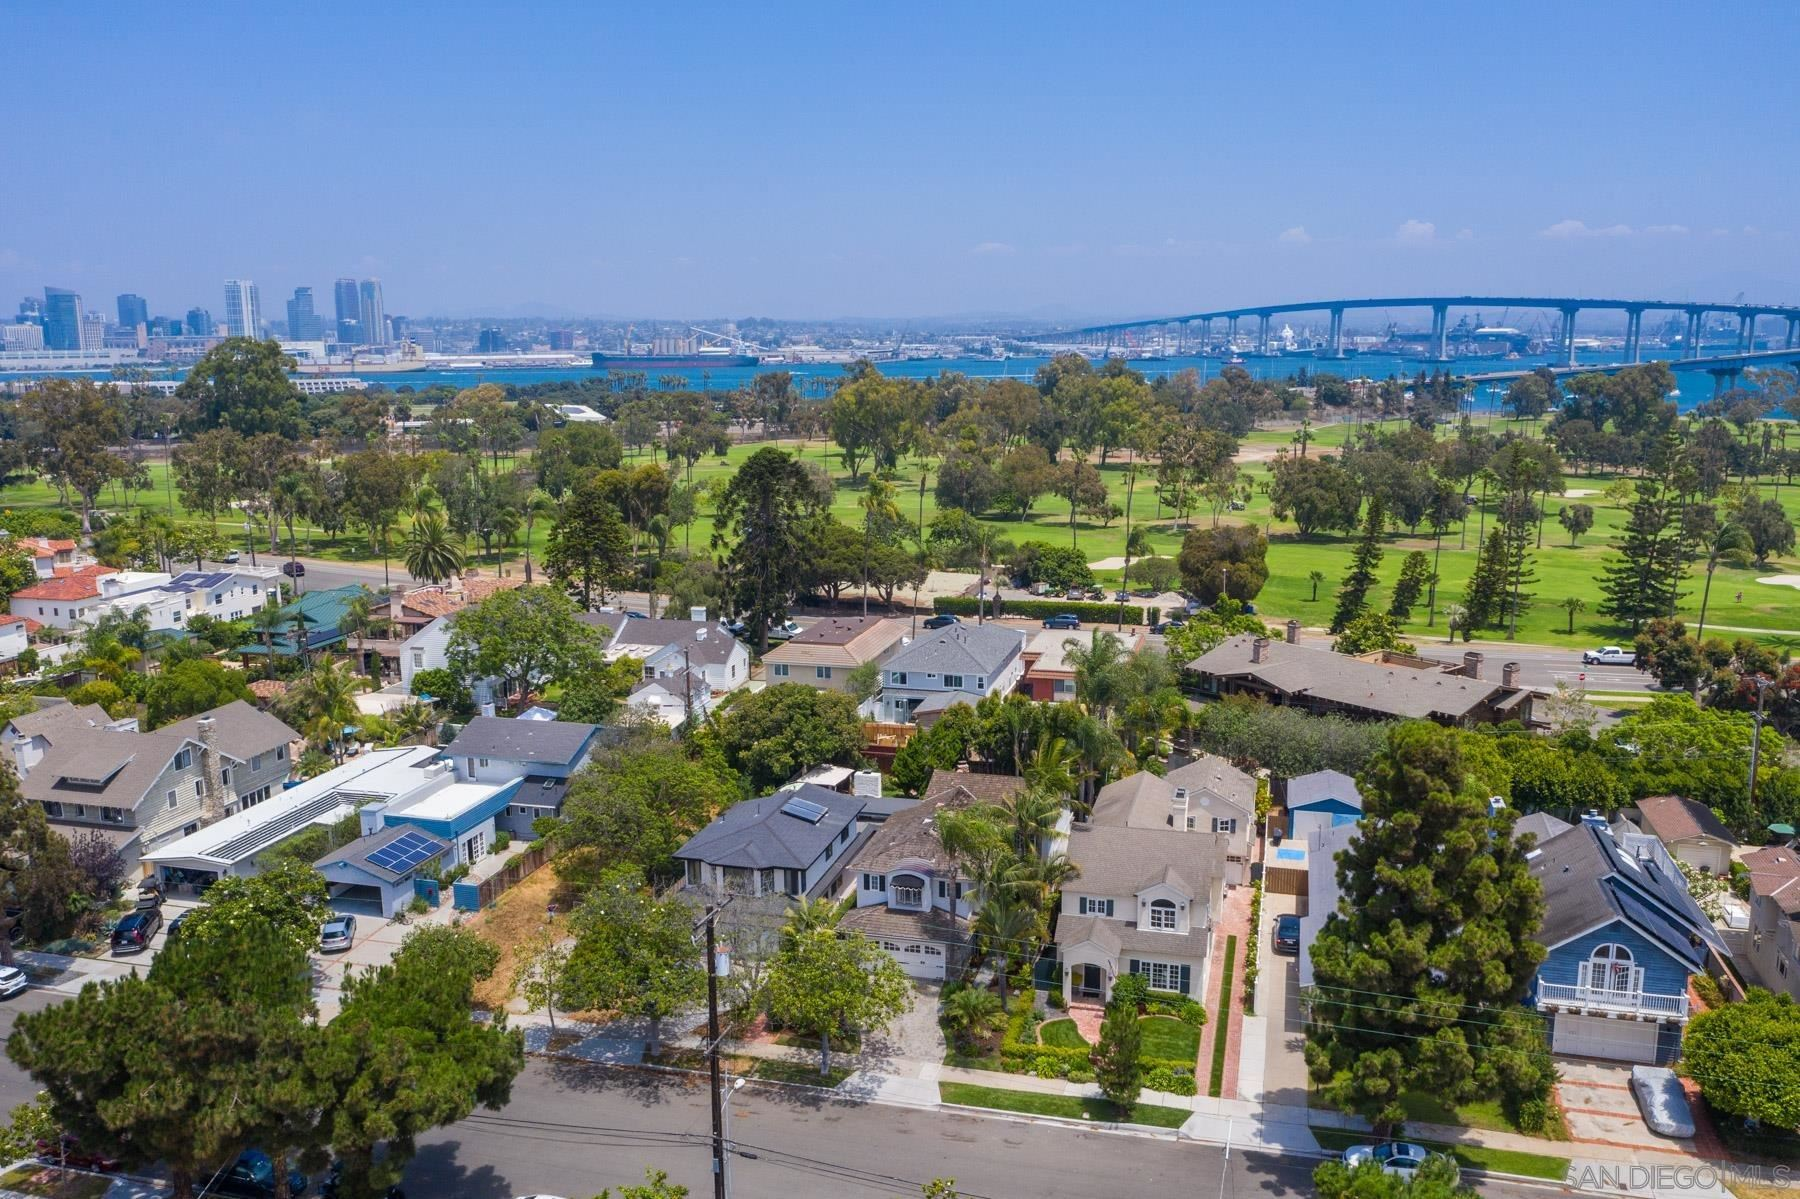 Photo of 667 Margarita Ave, Coronado, CA 92118 (MLS # 210021333)